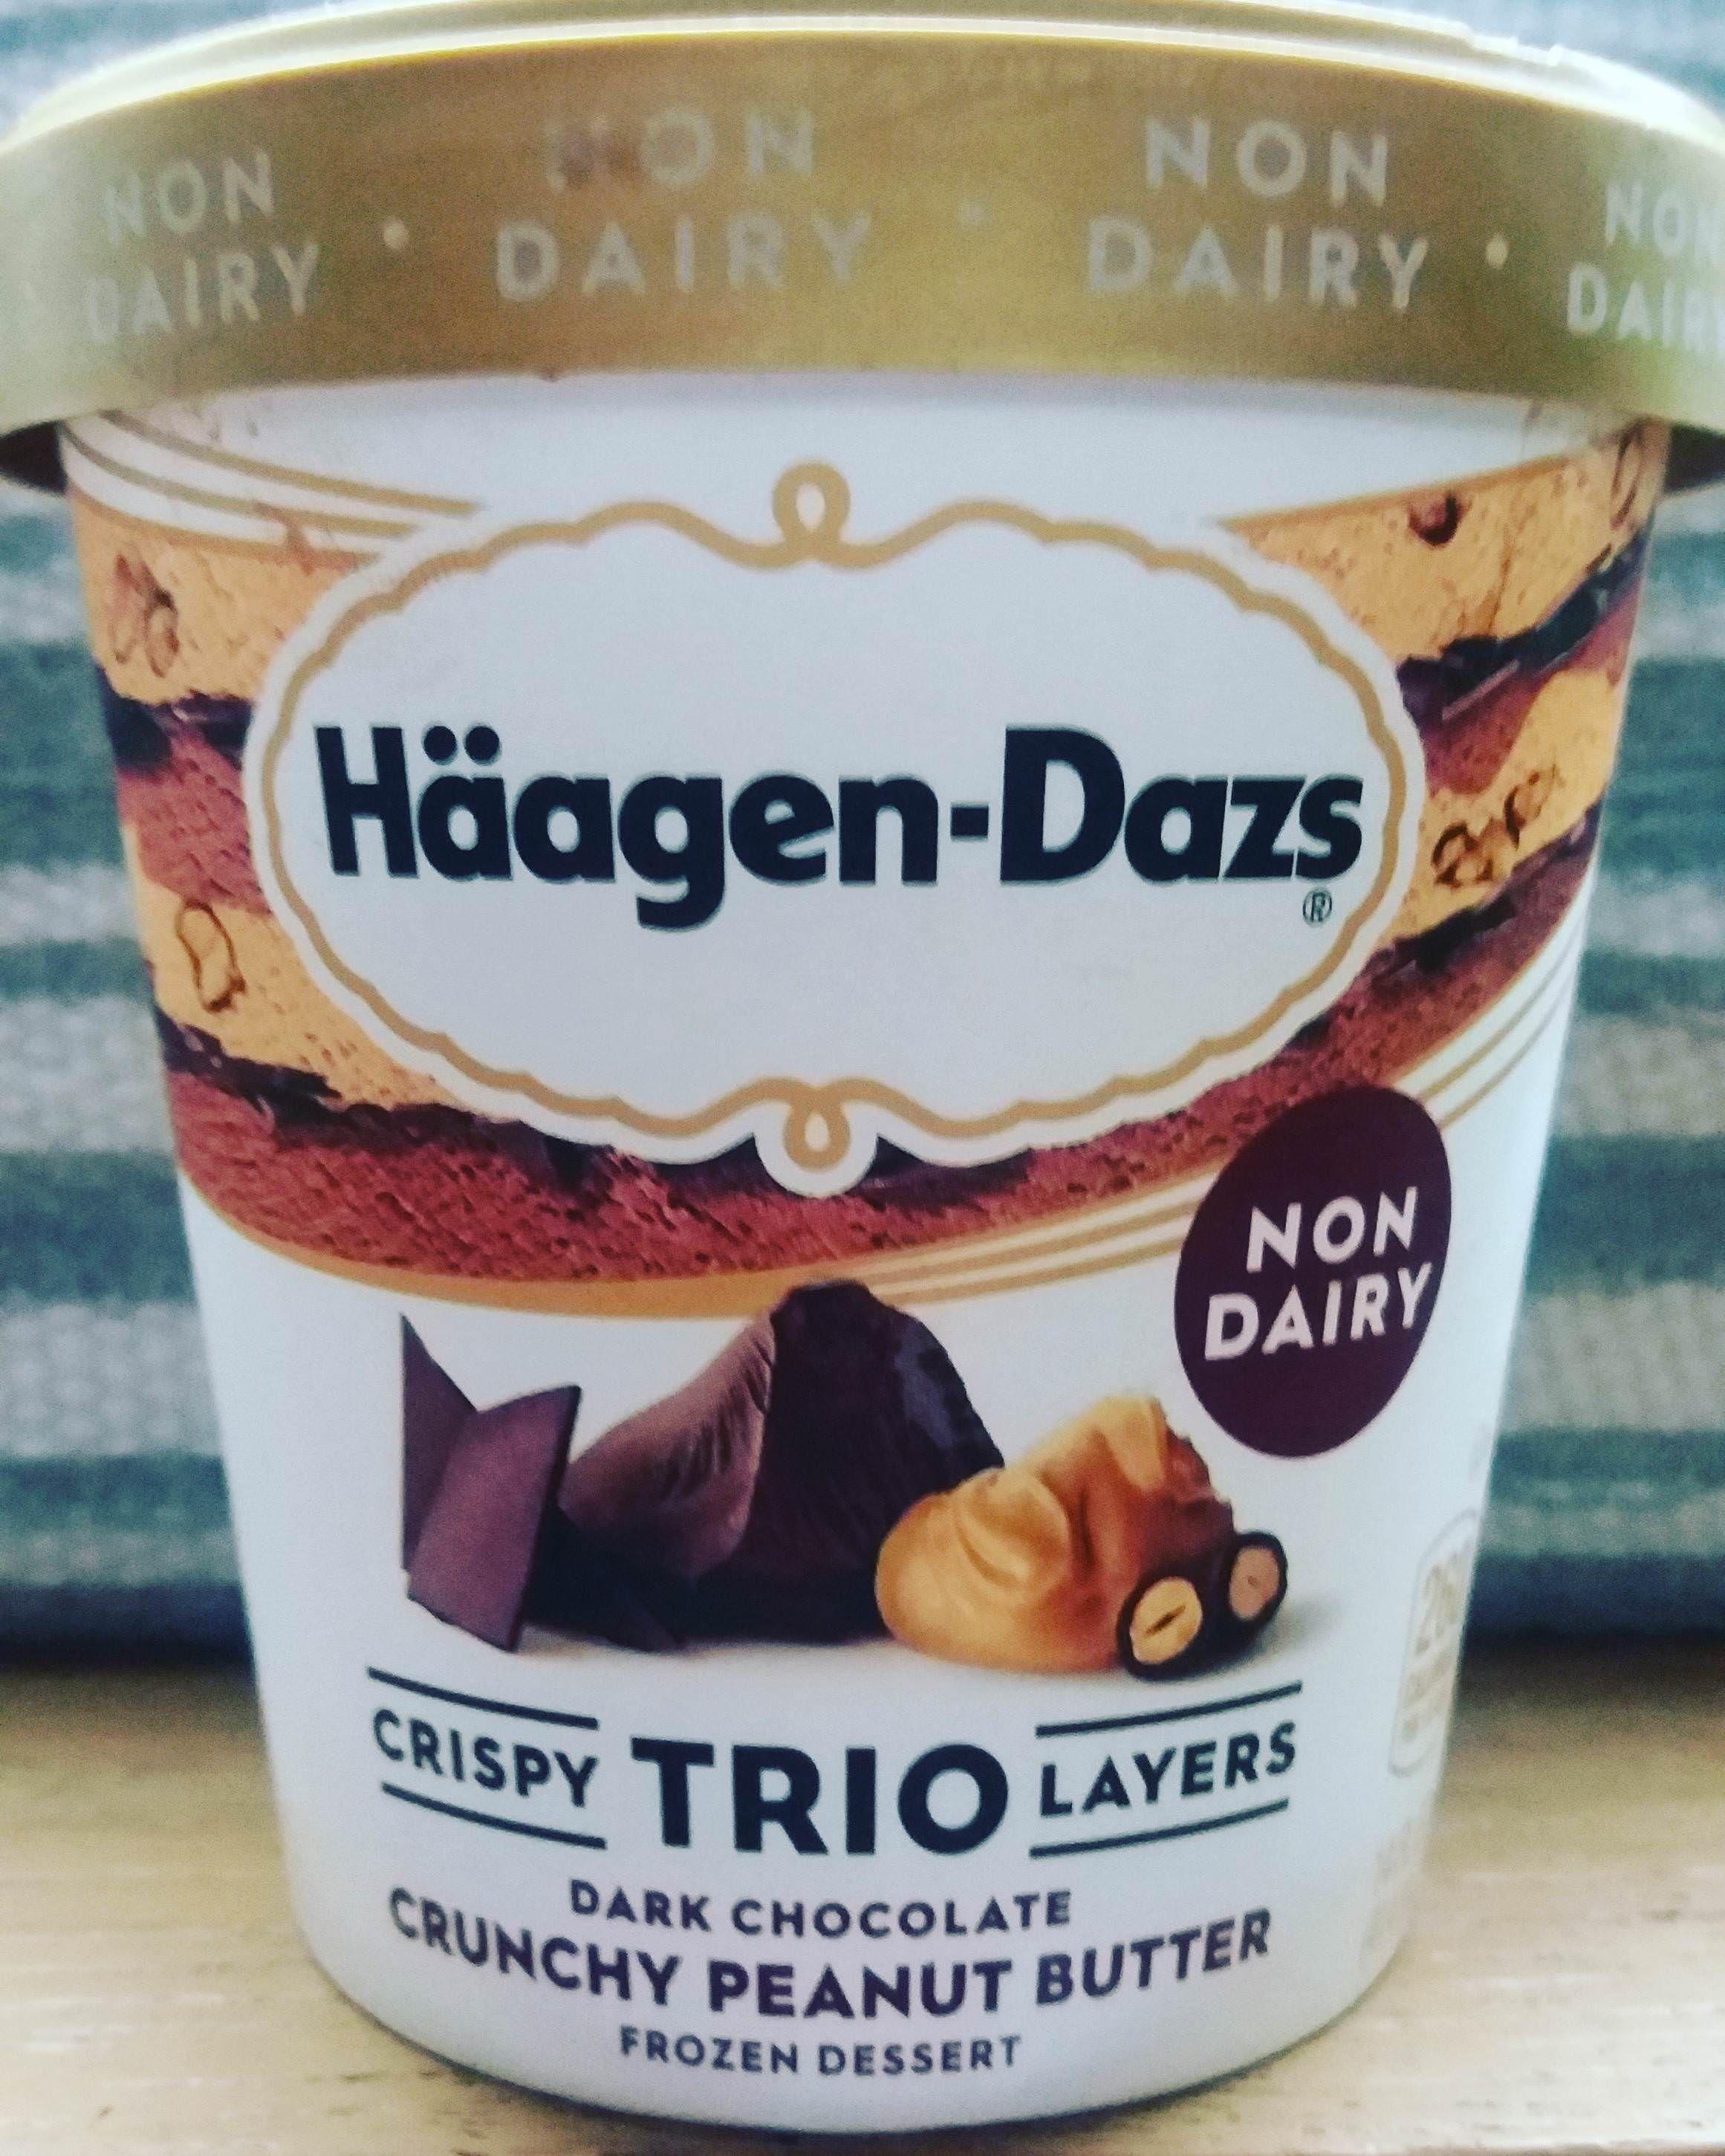 marketing mix haagen dazs and beechdean dairies The marketing mix at haagen-dazs – and beechdean dairies essay  organic ice cream essay.